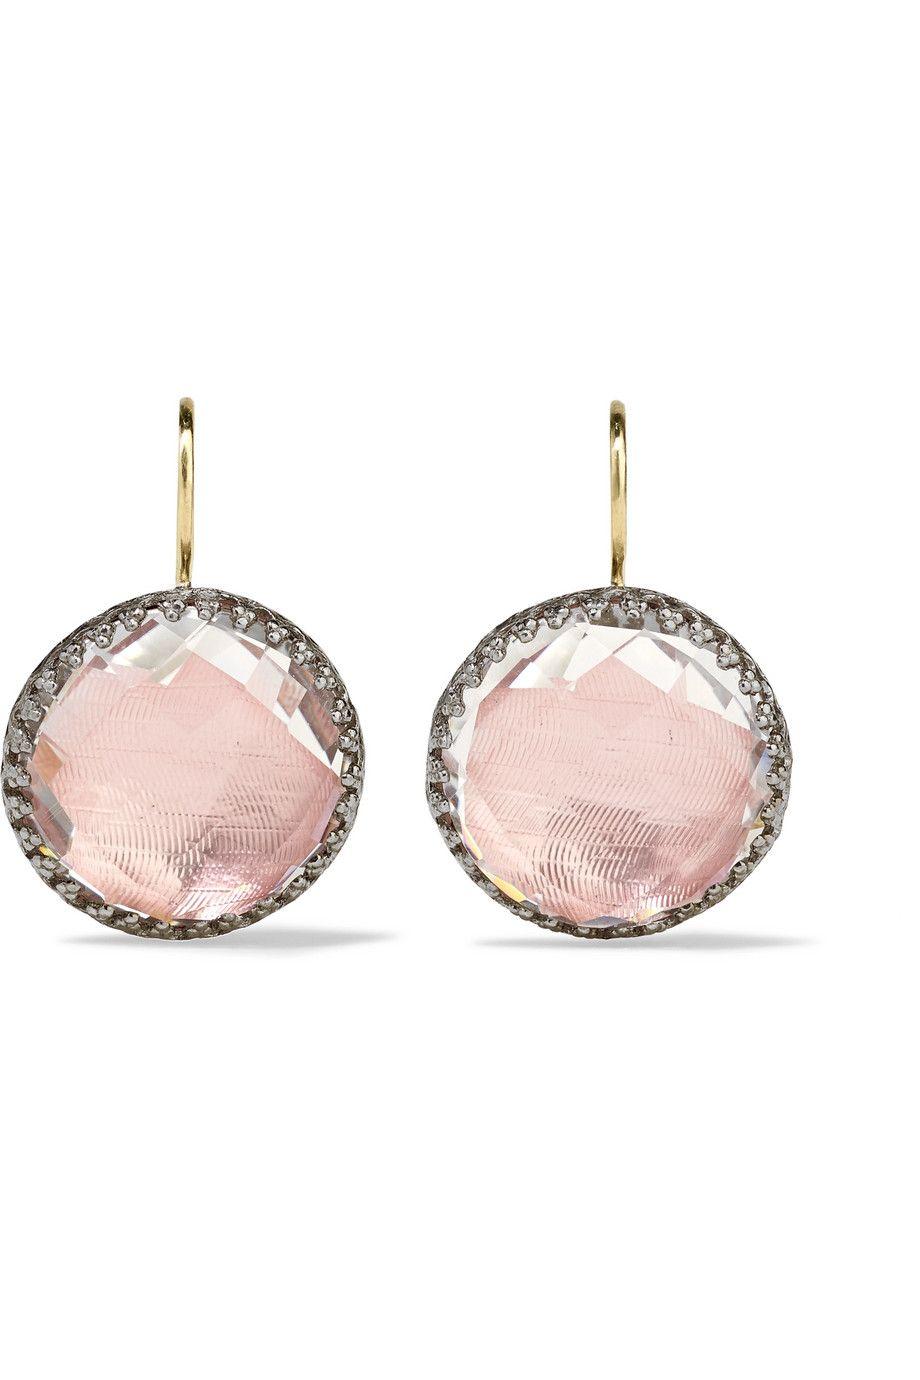 Olivia Rhodium-dipped Topaz Earrings - Gold Larkspur & Hawk NhdKHVL